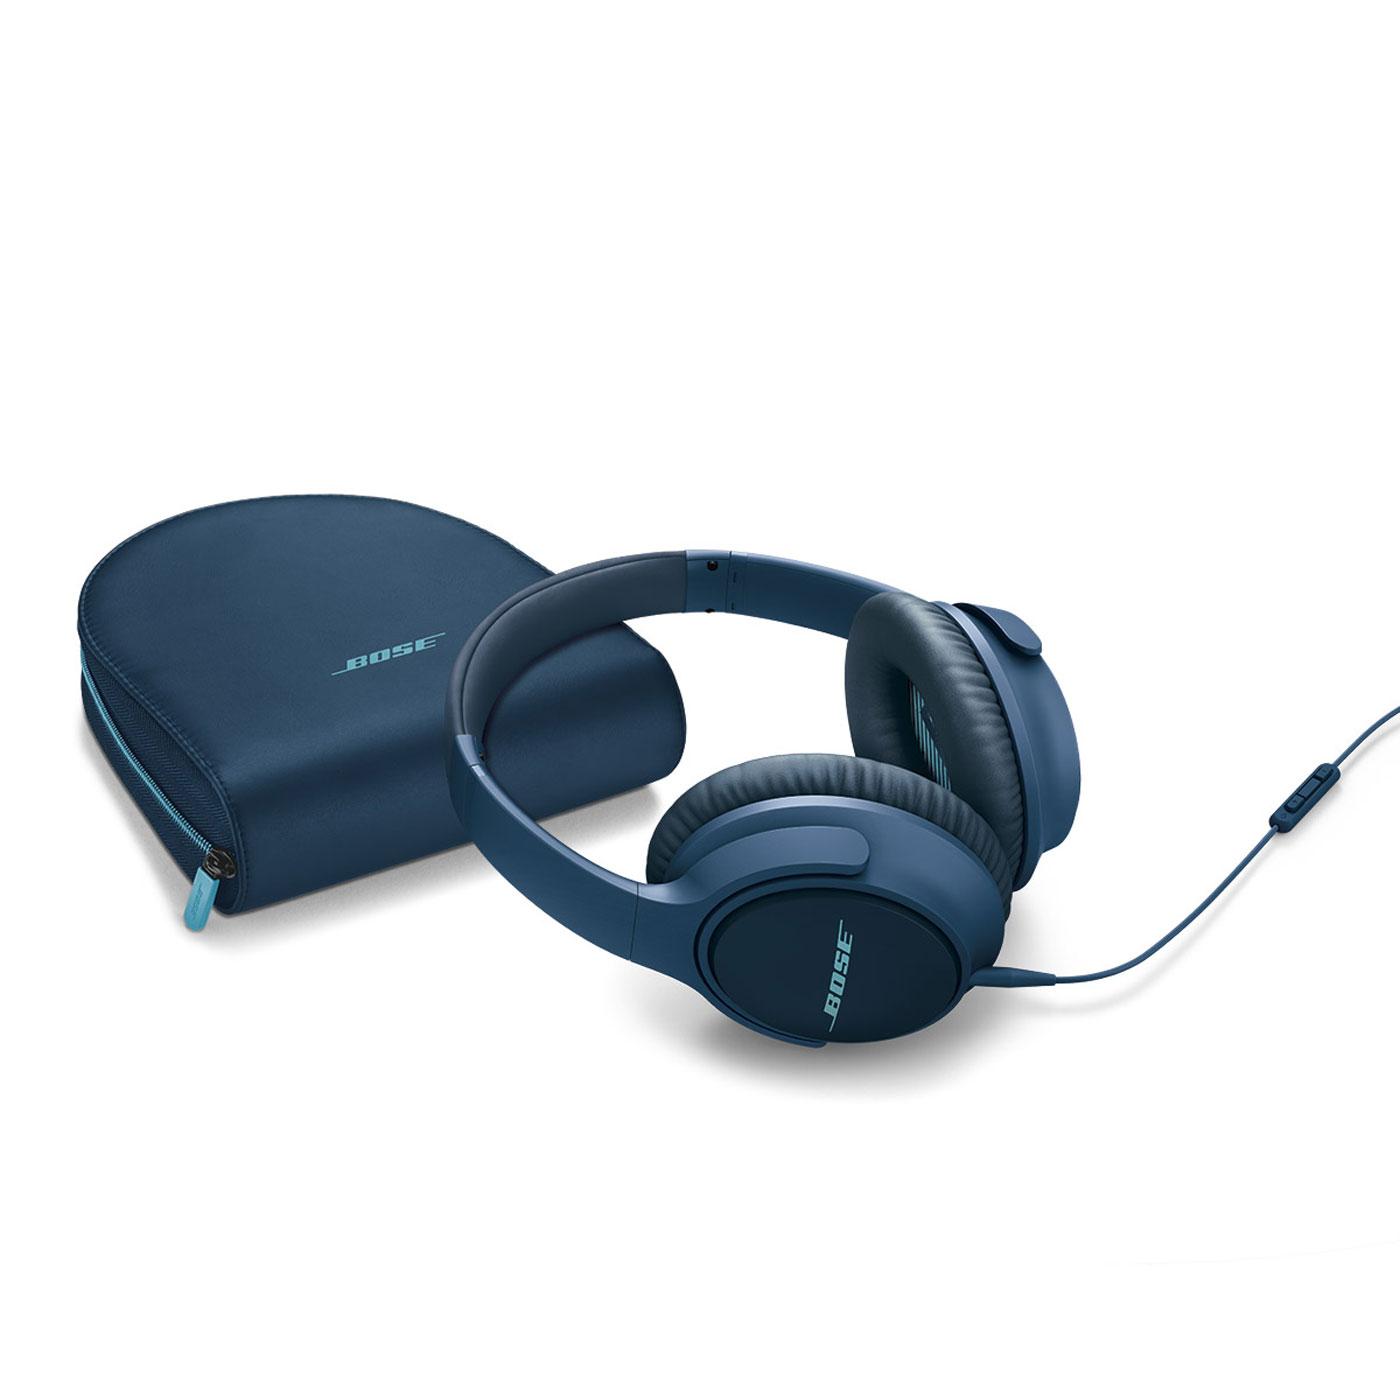 bose soundtrue around ear ii samsung android bleu casque bose sur ldlc. Black Bedroom Furniture Sets. Home Design Ideas